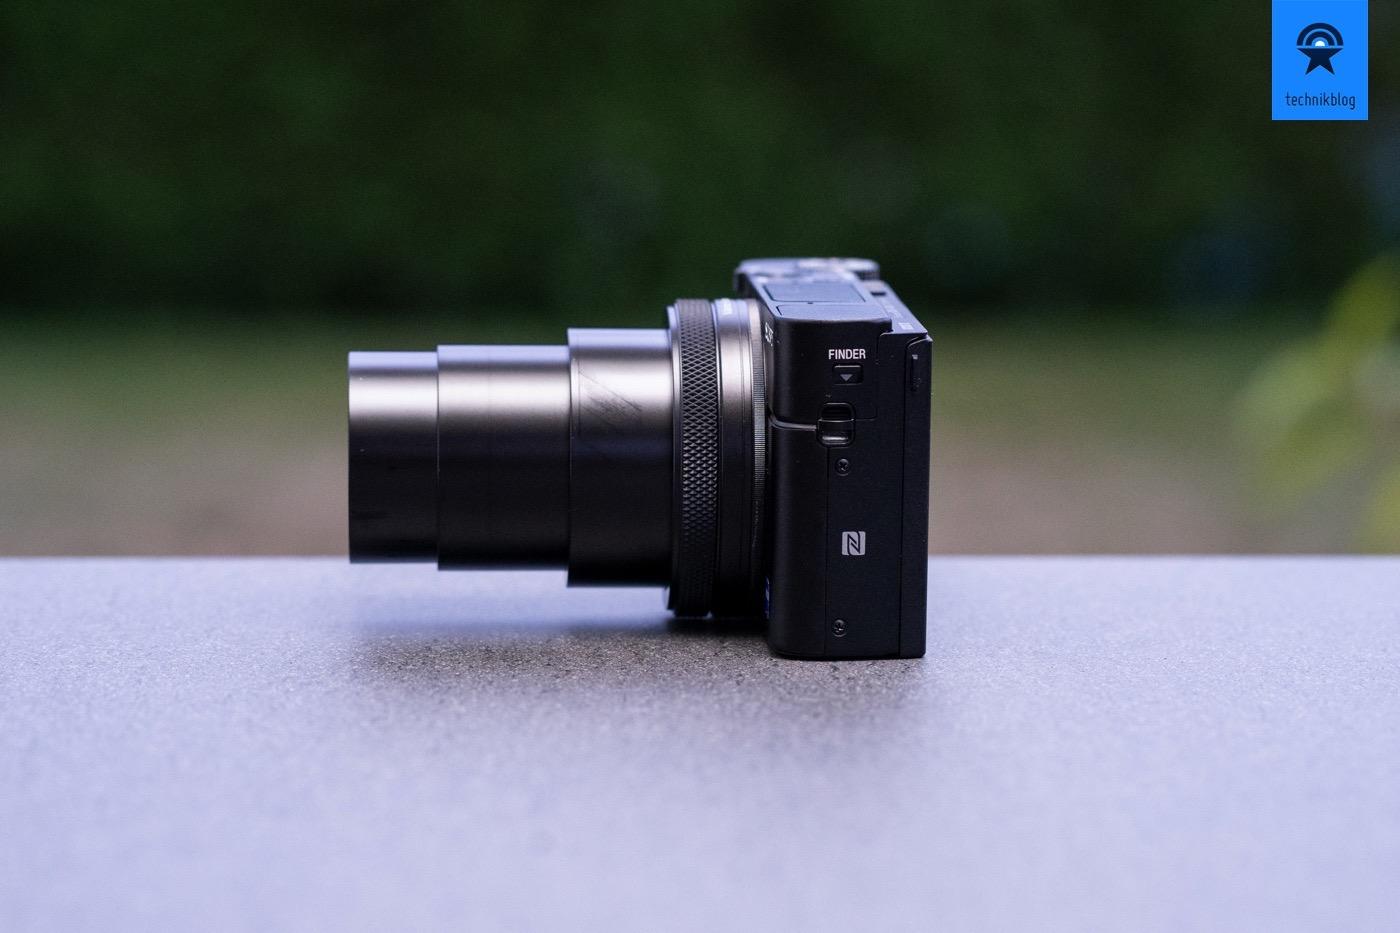 Das grosse 24-200mm Objektiv der Sony RX100 VI